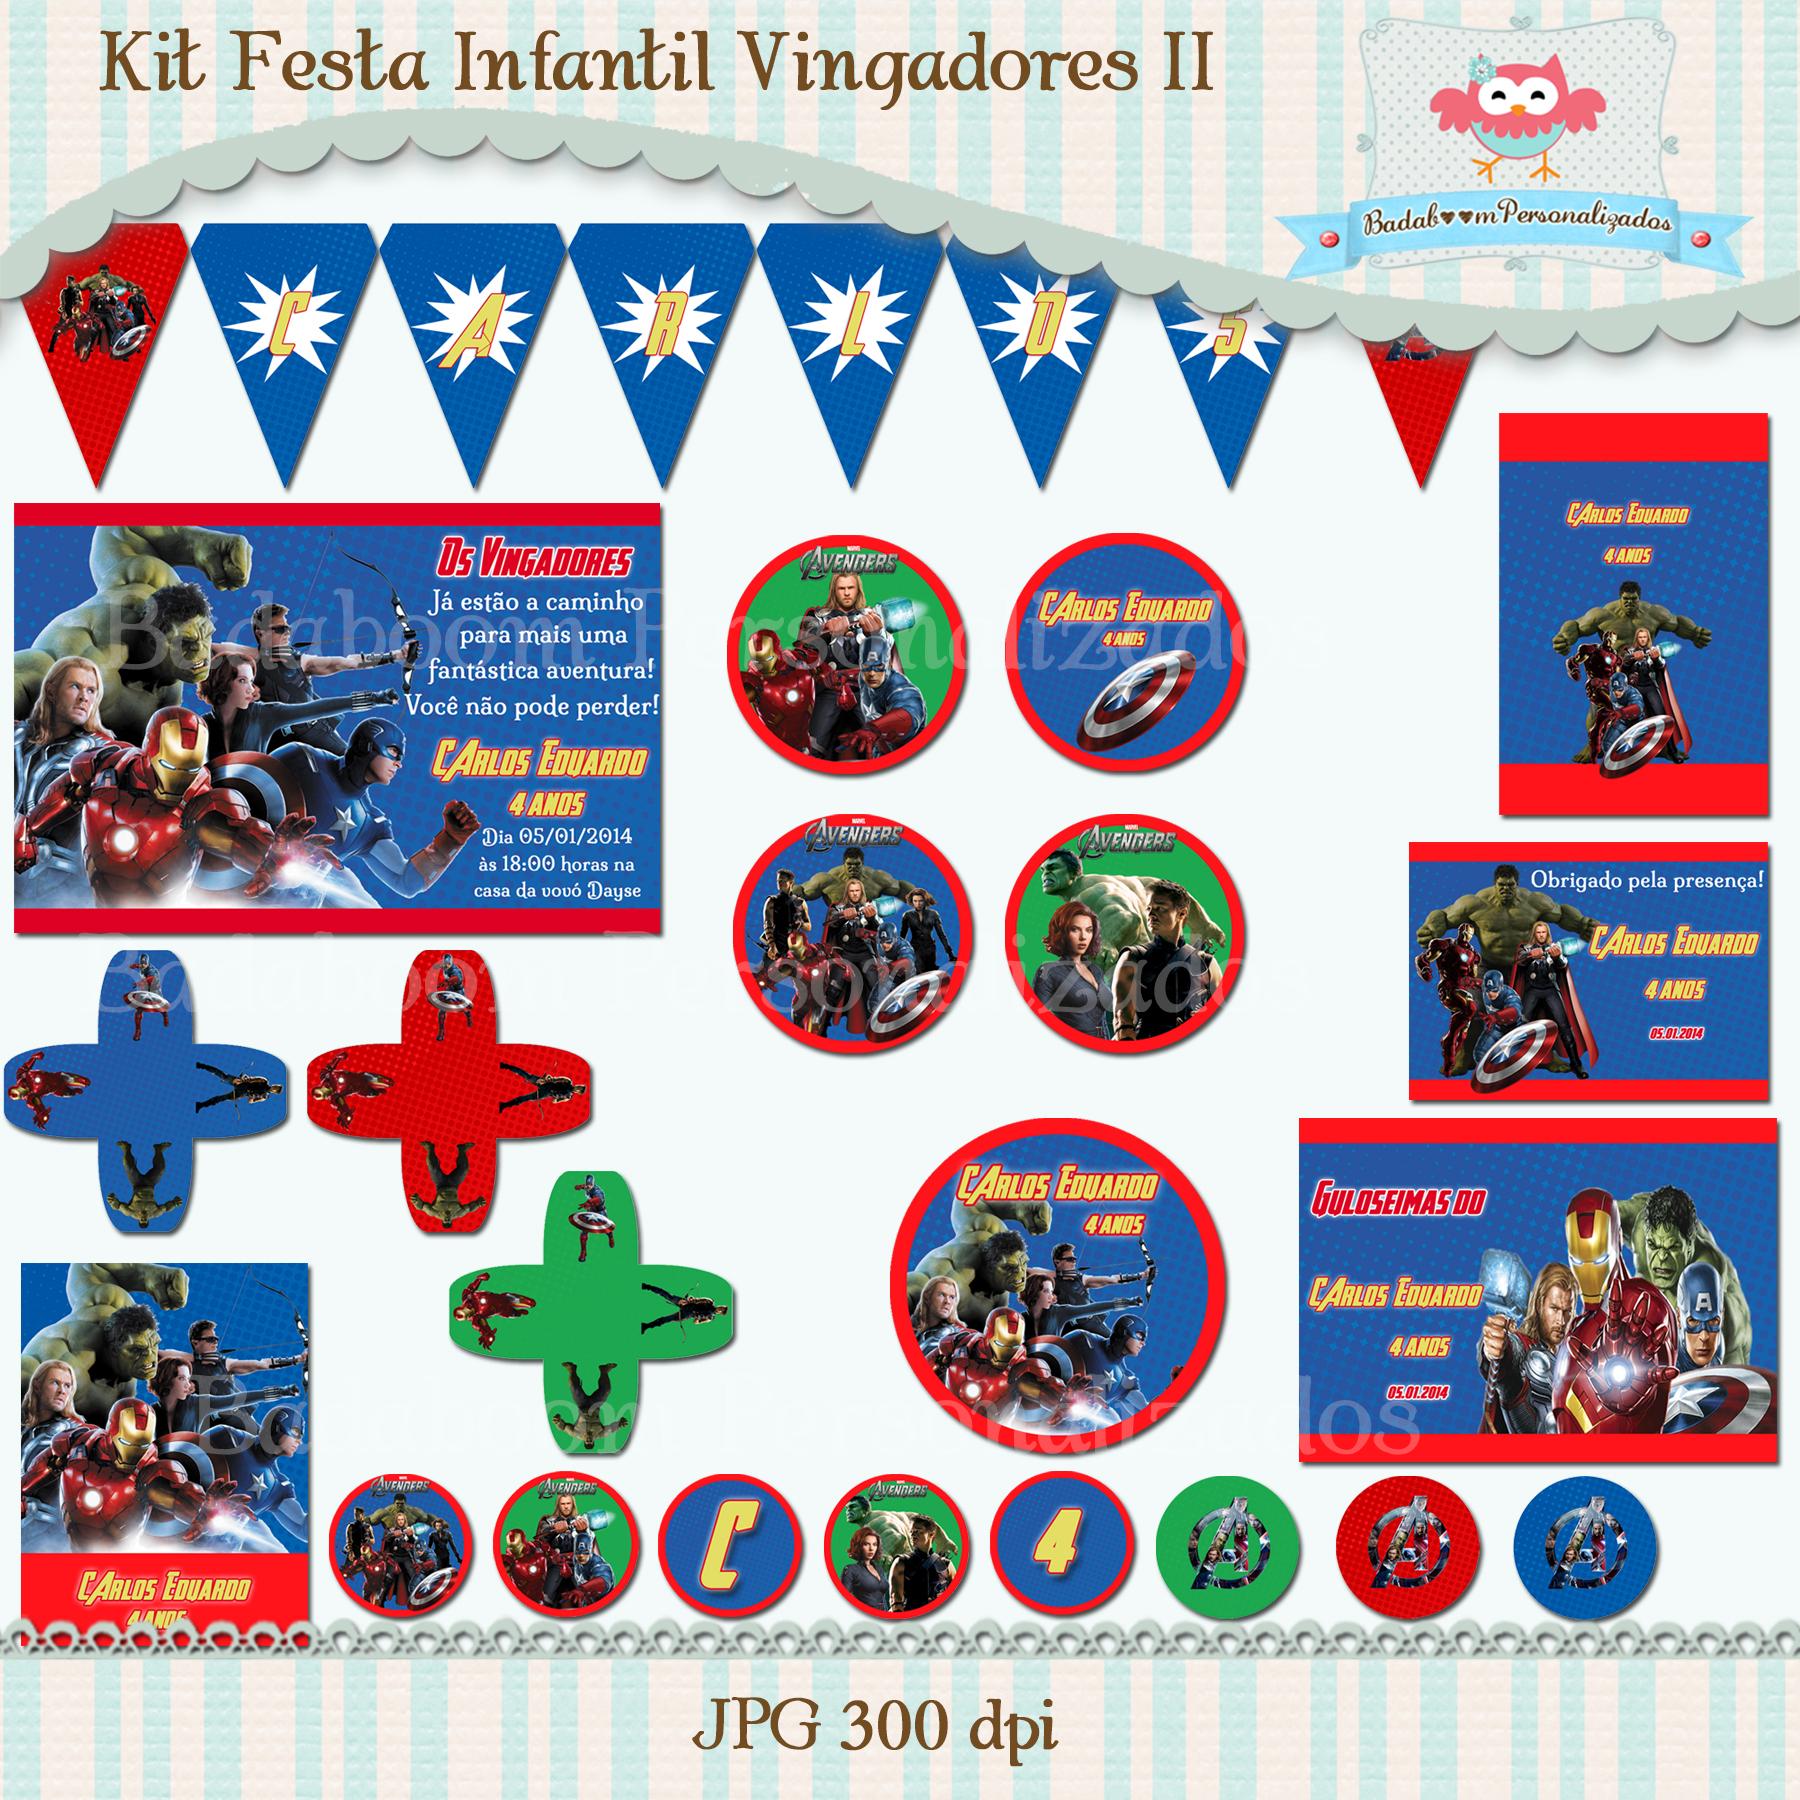 Kit Festa Infantil Vingadores II (arte)  Badaboom Personalizados